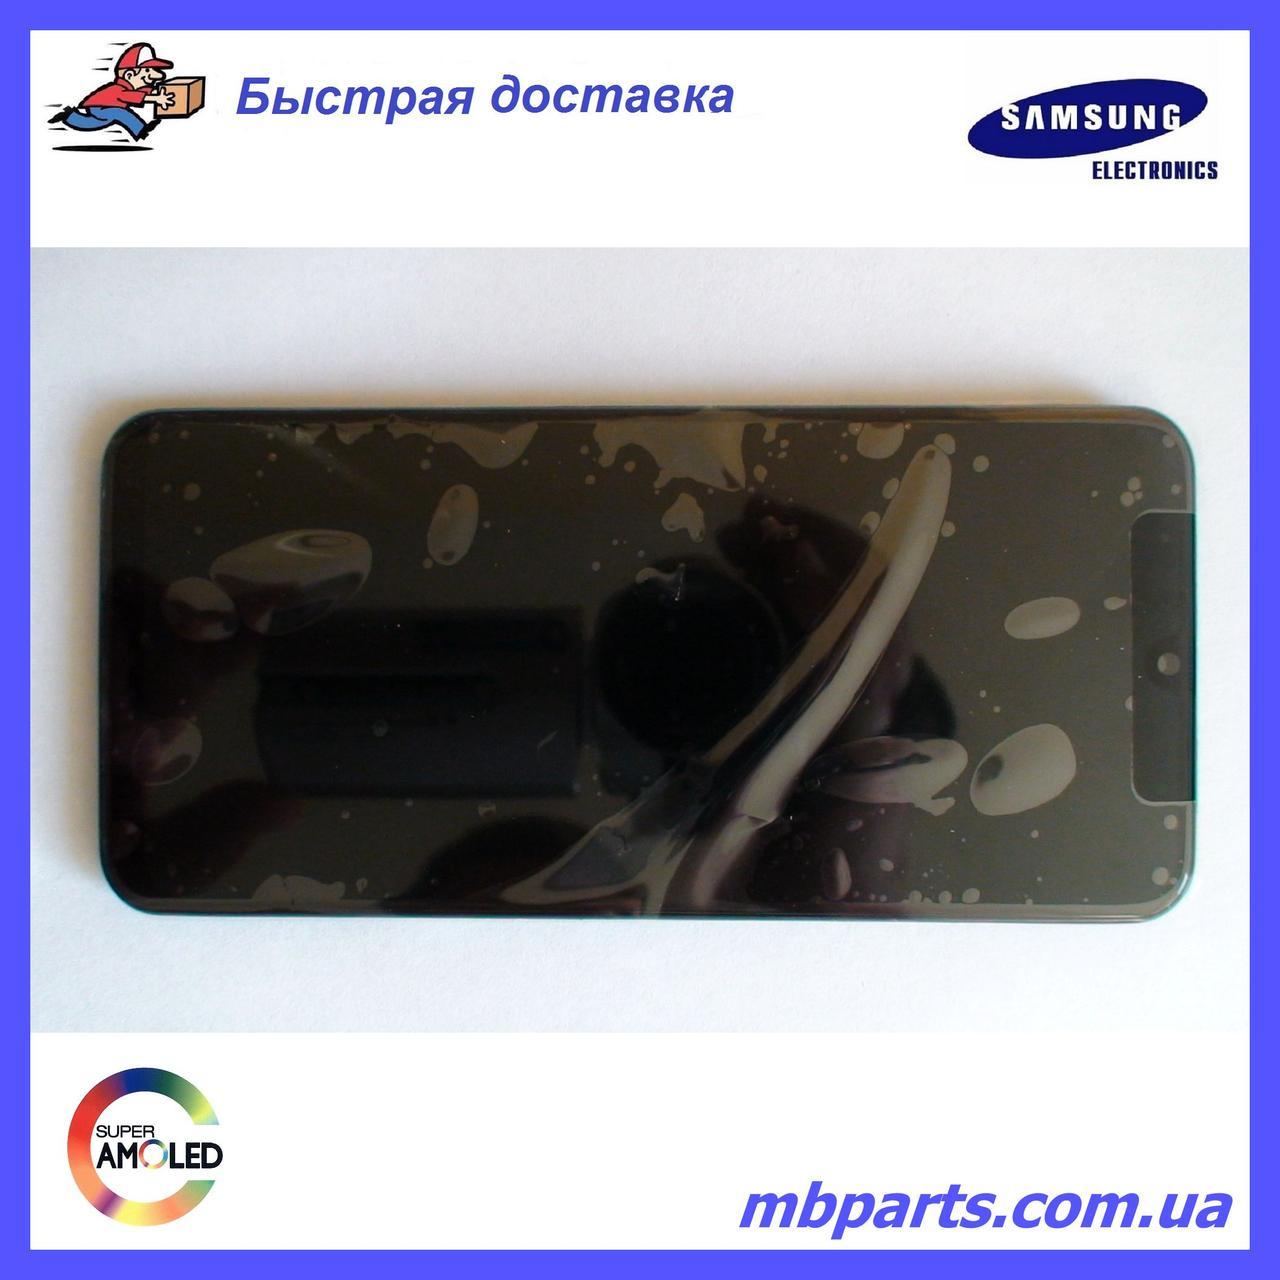 Дисплей с сенсором Samsung A305 Galaxy A30 Black, GH82-19202A, оригинал!